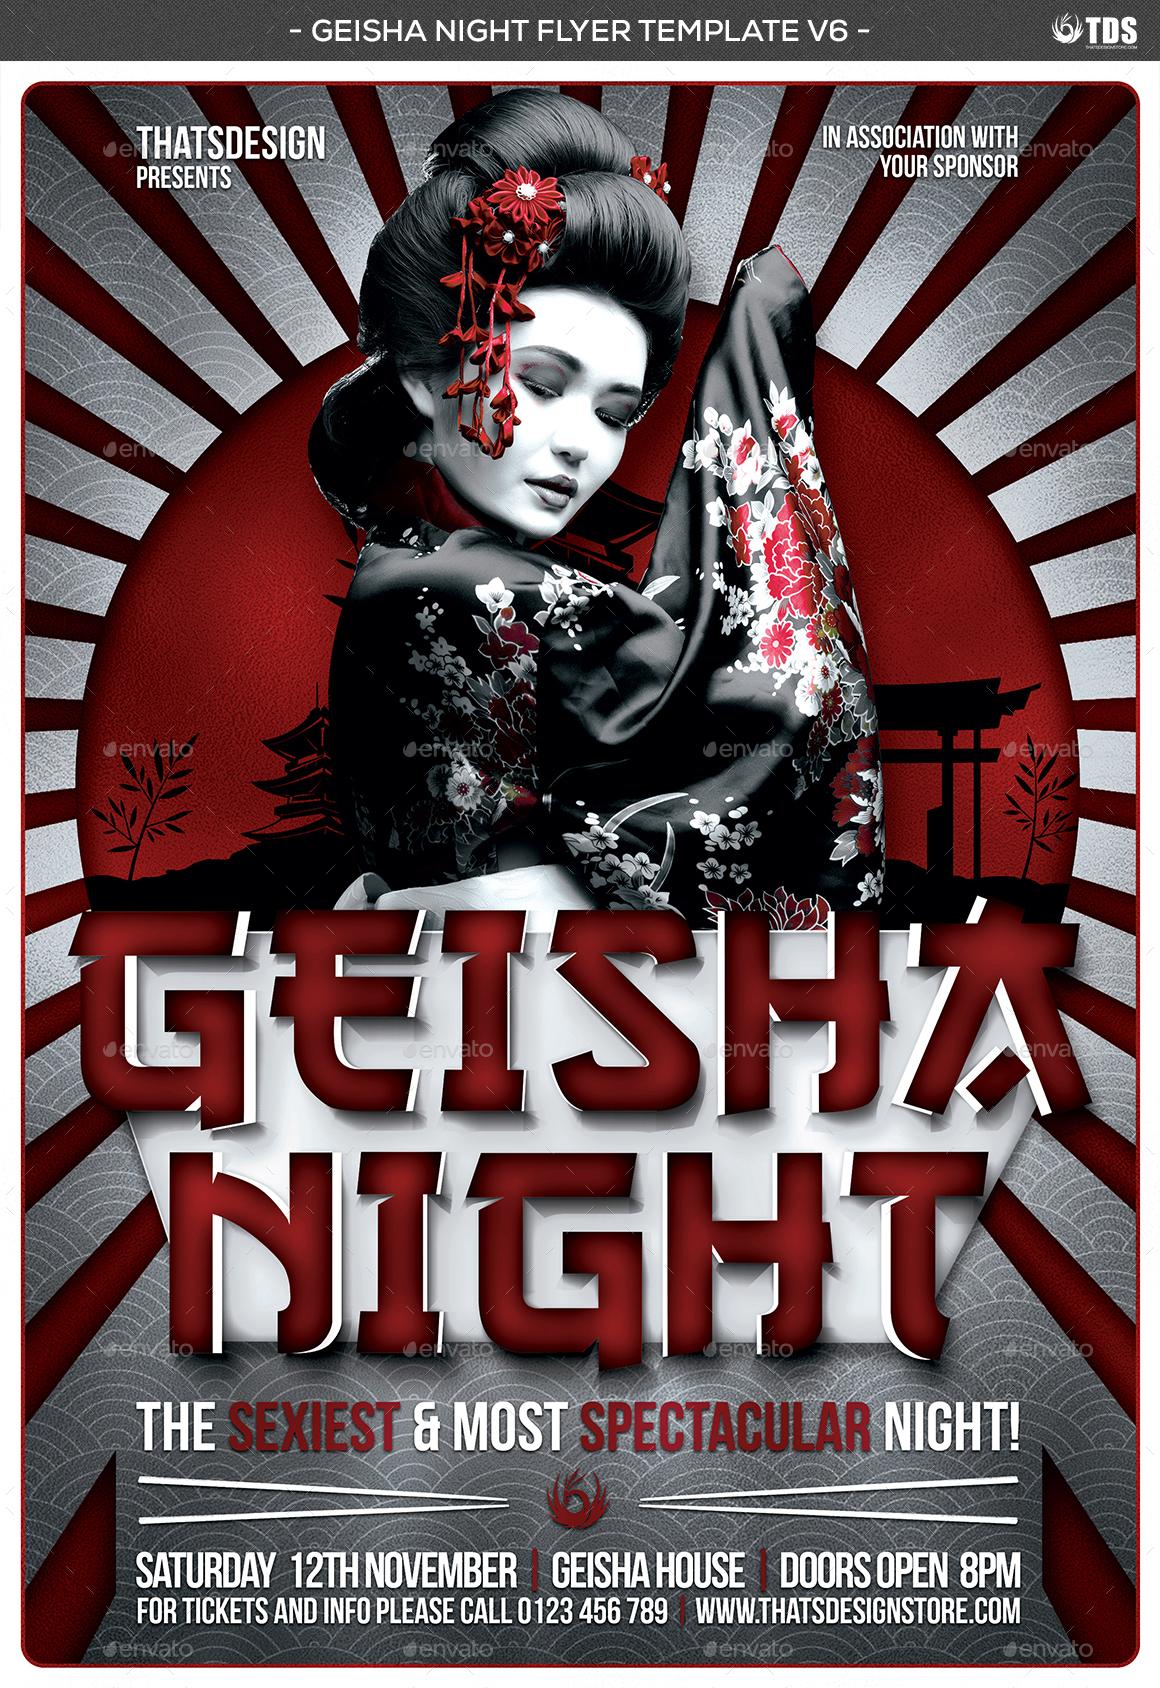 Geisha Night Flyer Template V6 by lou606 – Movie Night Flyer Template